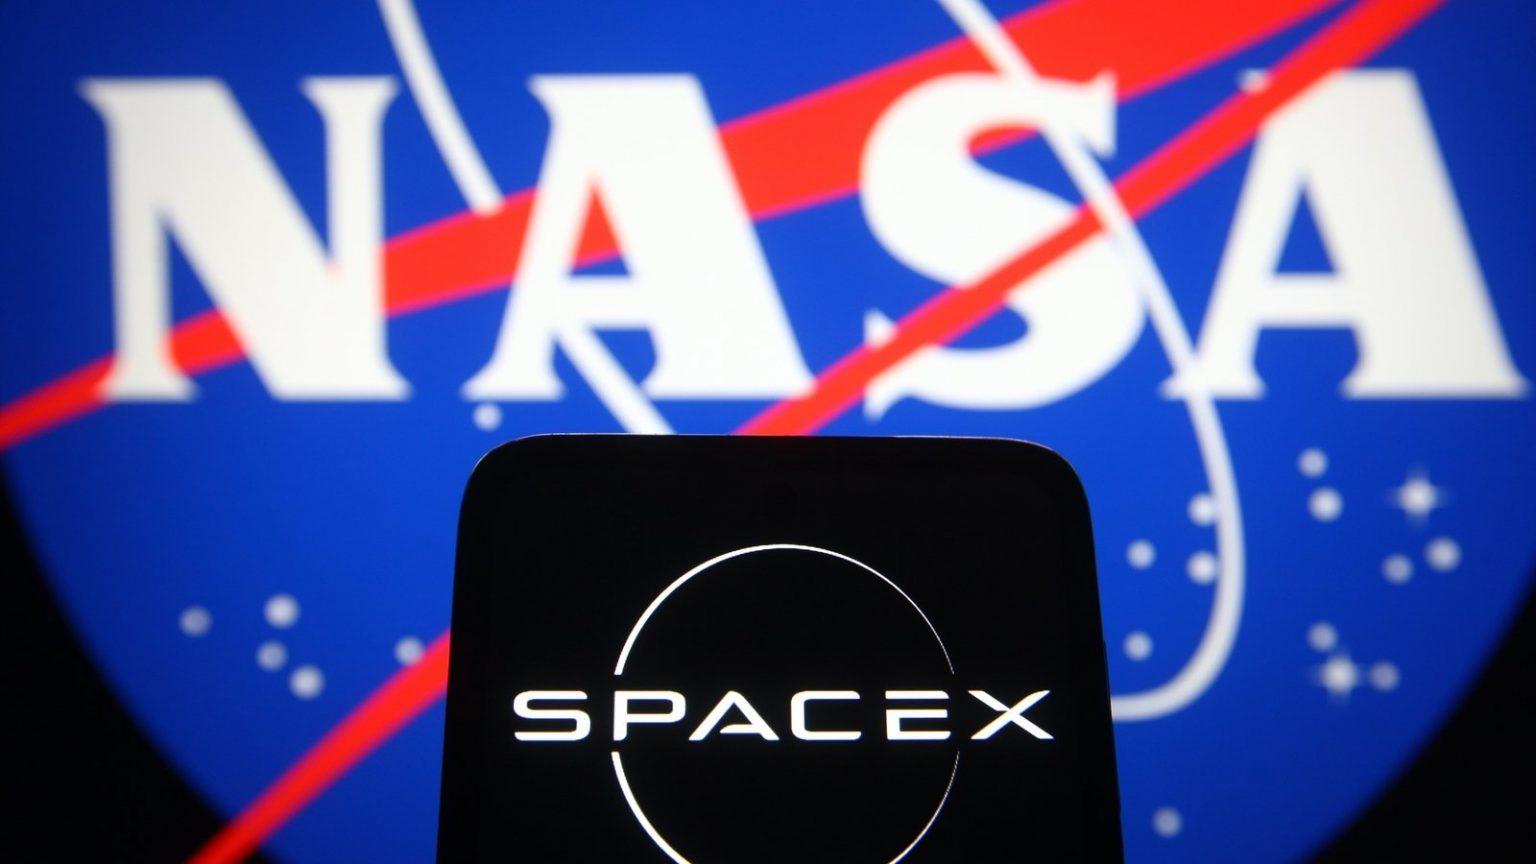 NASA selects SpaceX for mission to Jupiter moon Europa   নাসা বৃহস্পতির চাঁদ ইউরোপা মিশনের জন্য SpaceX কে নির্বাচন করেছে_40.1